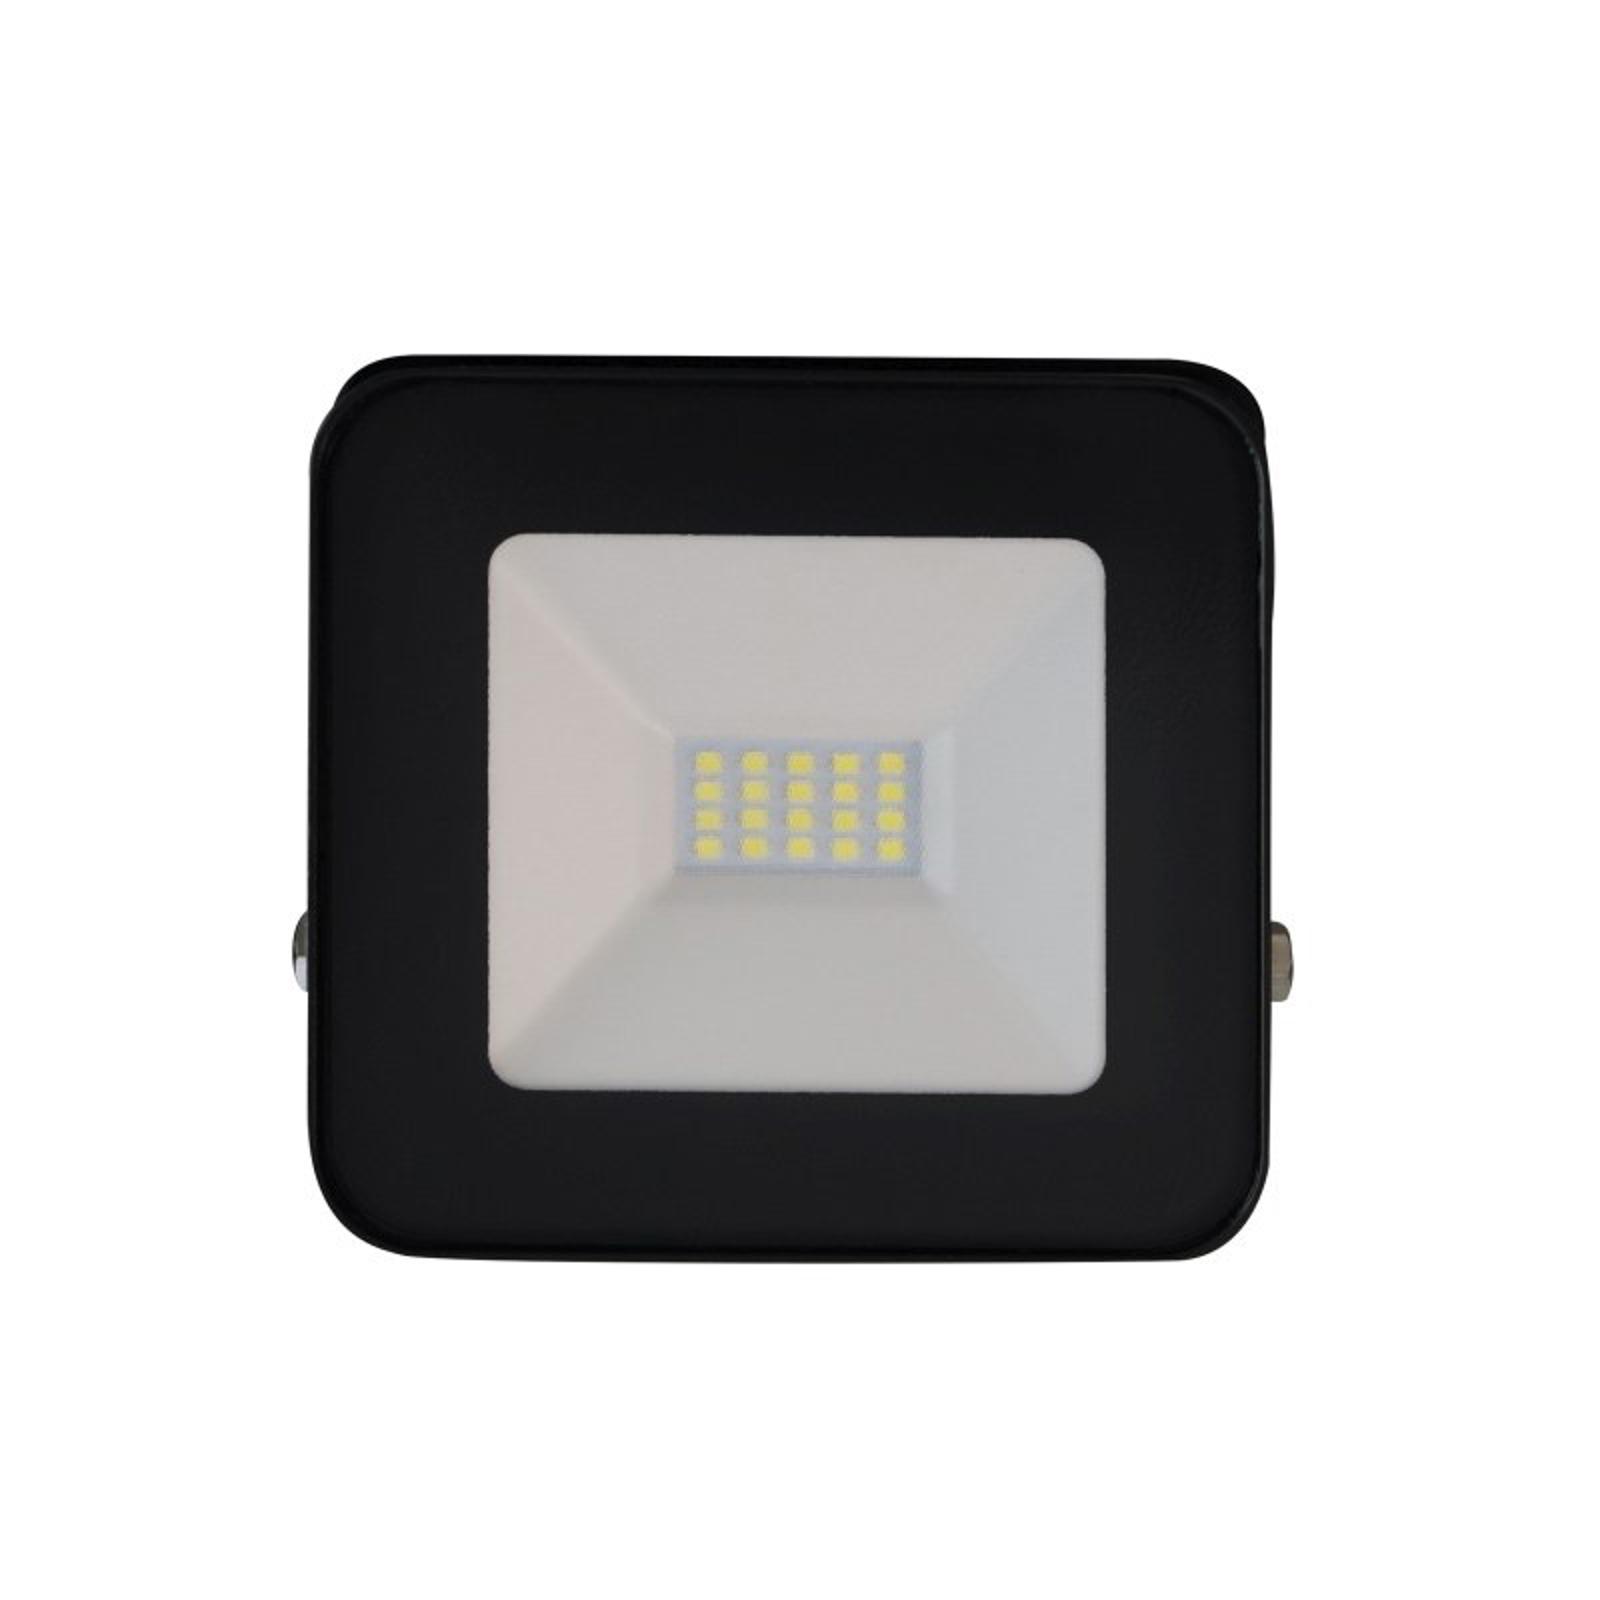 John-LED-kohdevalaisin ulos, musta 10 W